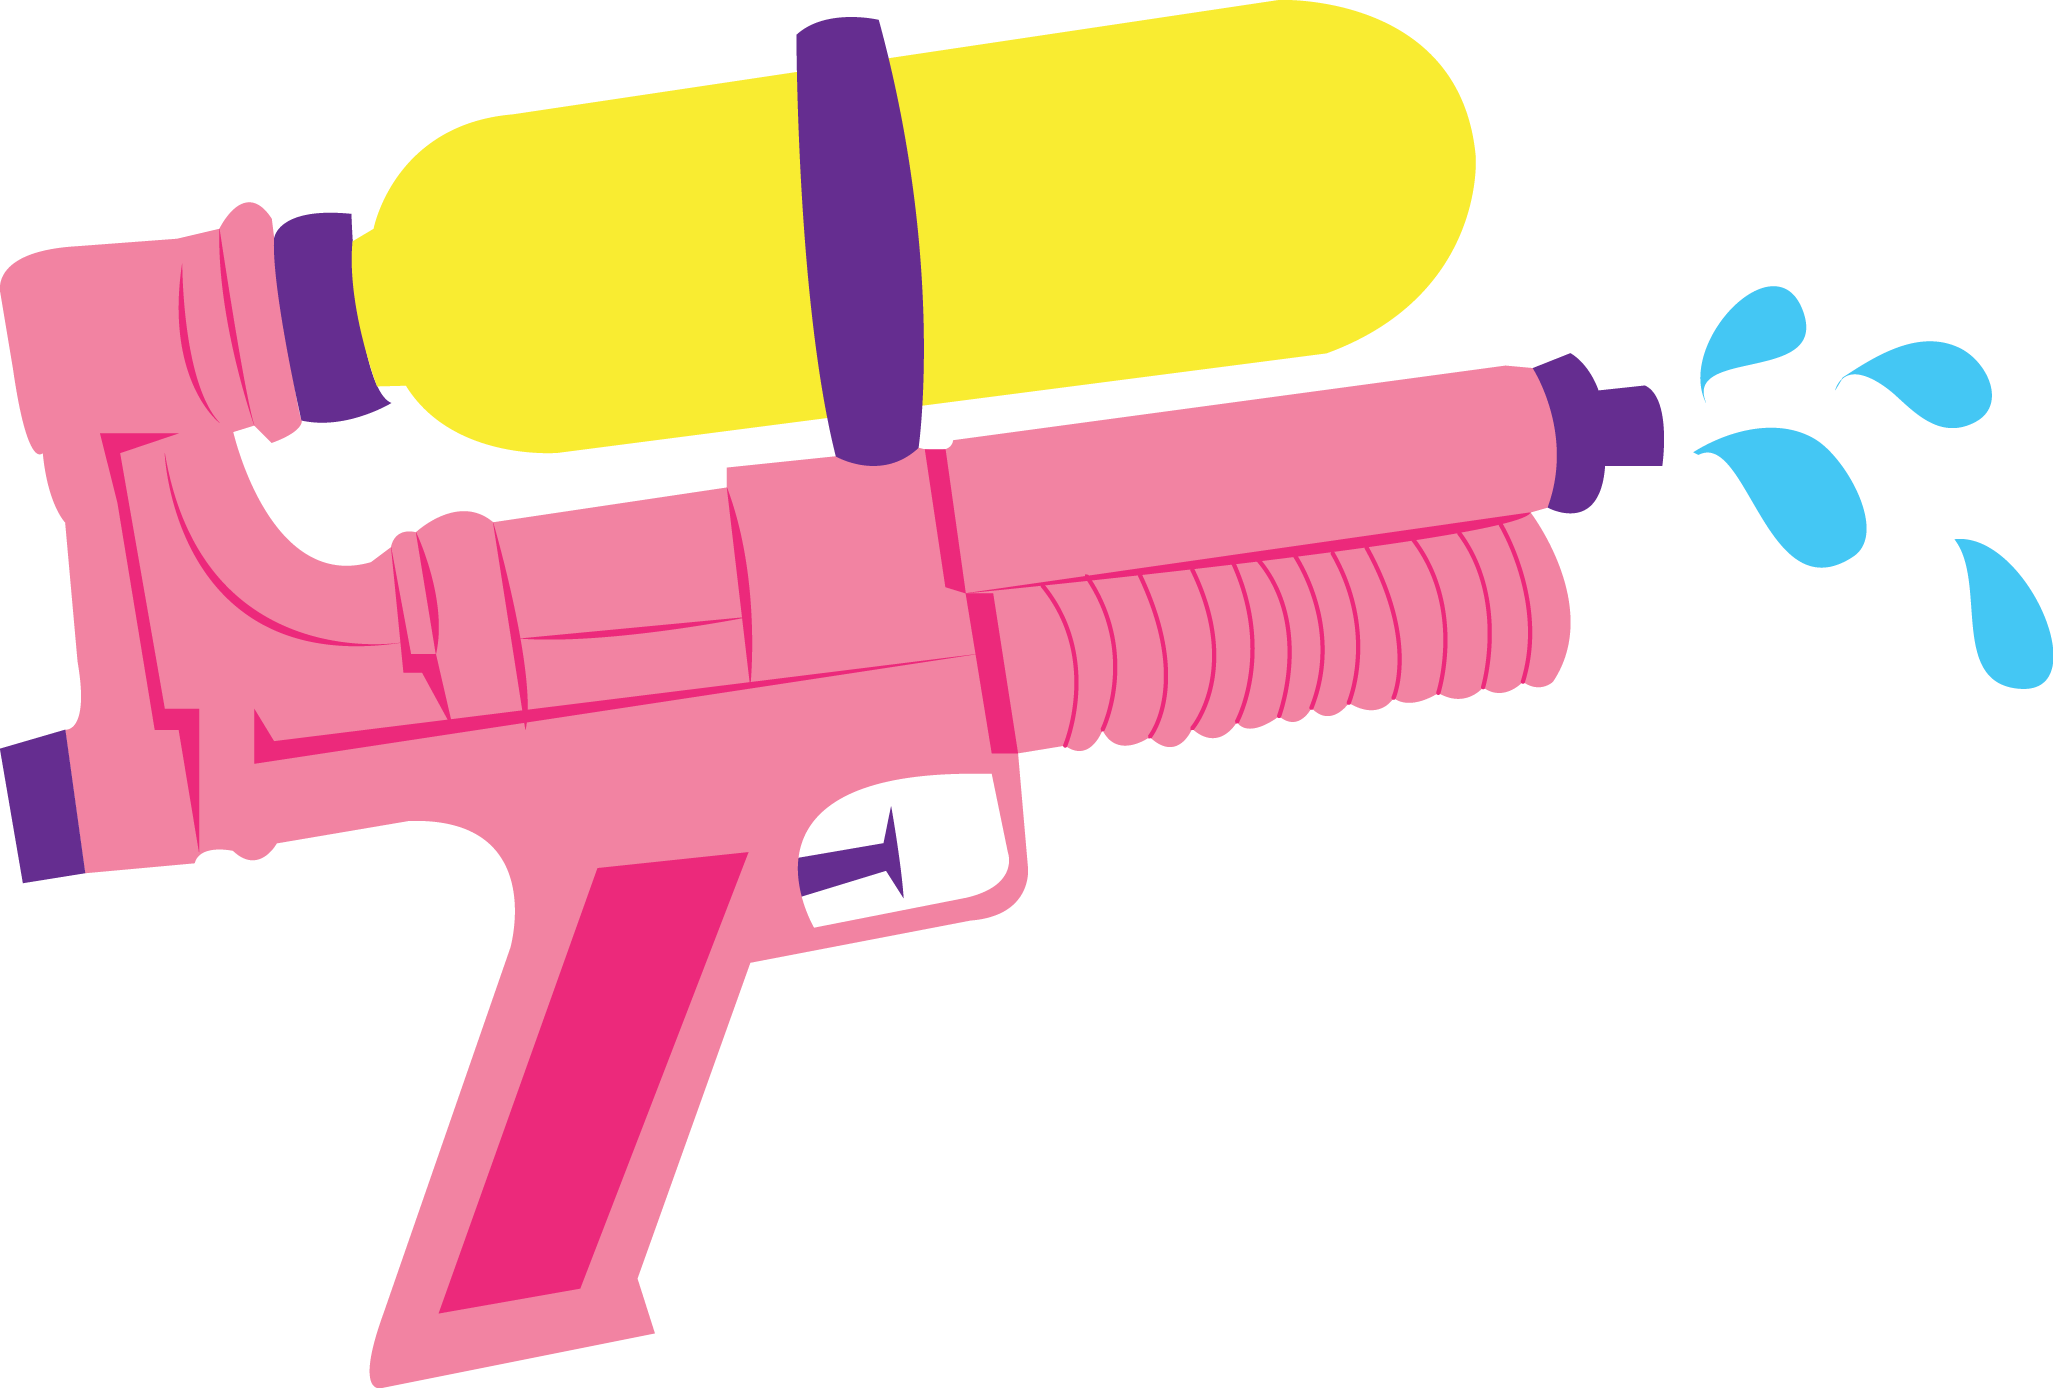 Laser clipart water pistol #5